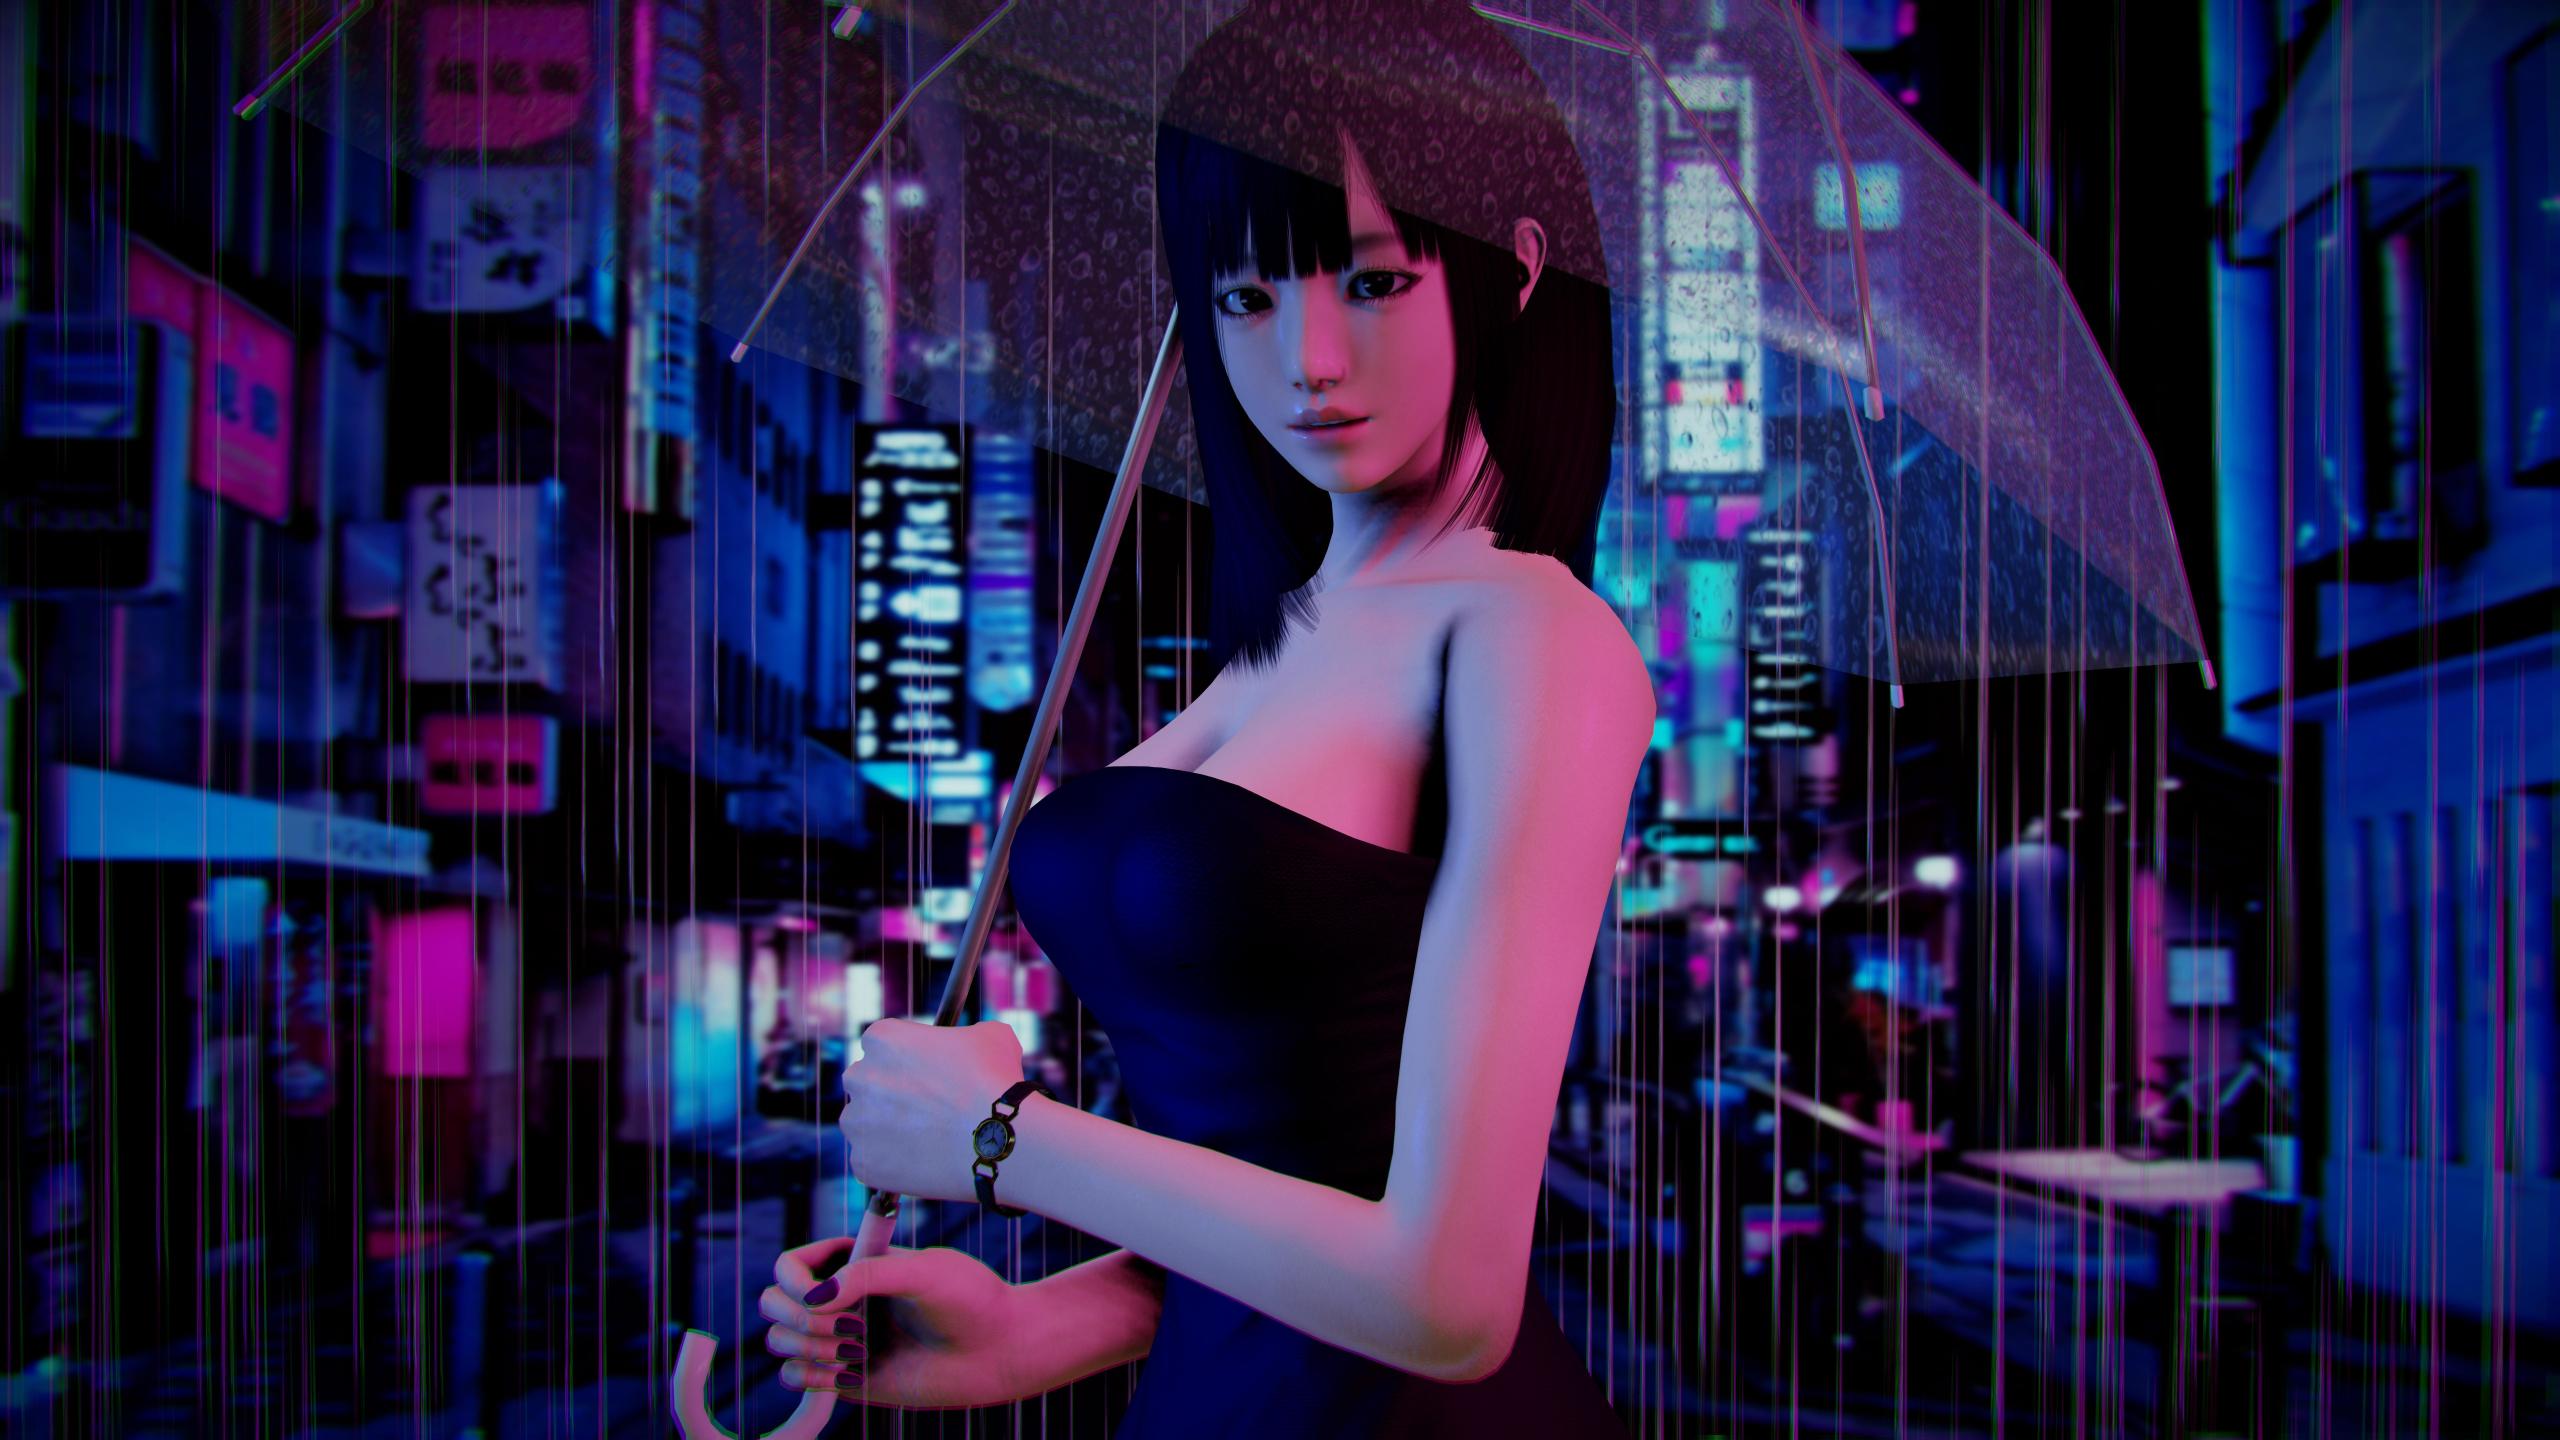 Download 2560x1440 Wallpaper Honey Select Studio Video Game Rain Umbrella Dual Wide Widescreen 16 9 Widescreen 2560x1440 Hd Image Background 2746